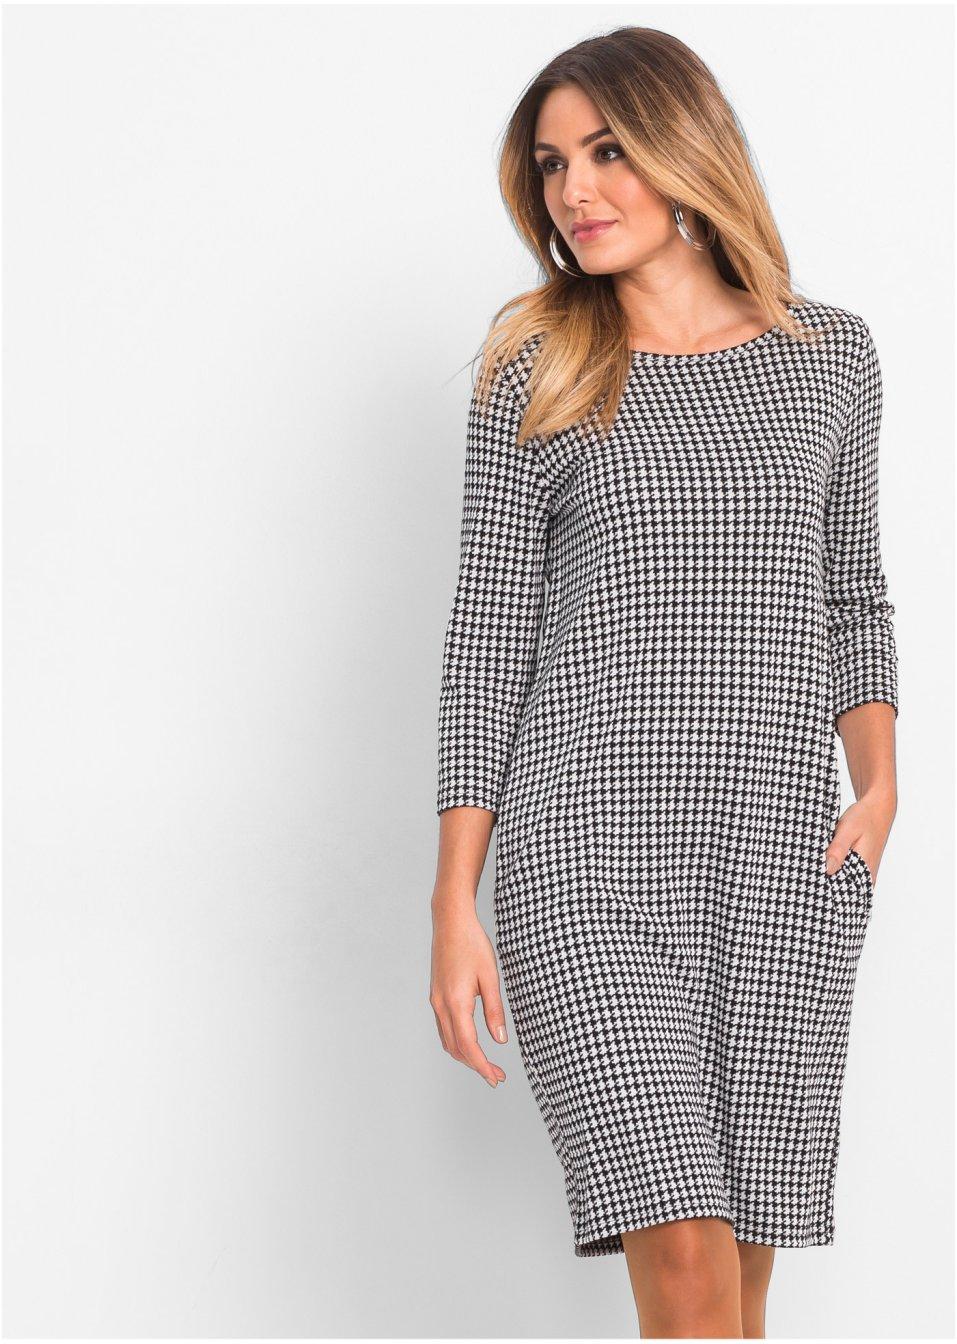 Kleid schwarz/weiss gemustert - Damen - BODYFLIRT - bonprix.ch